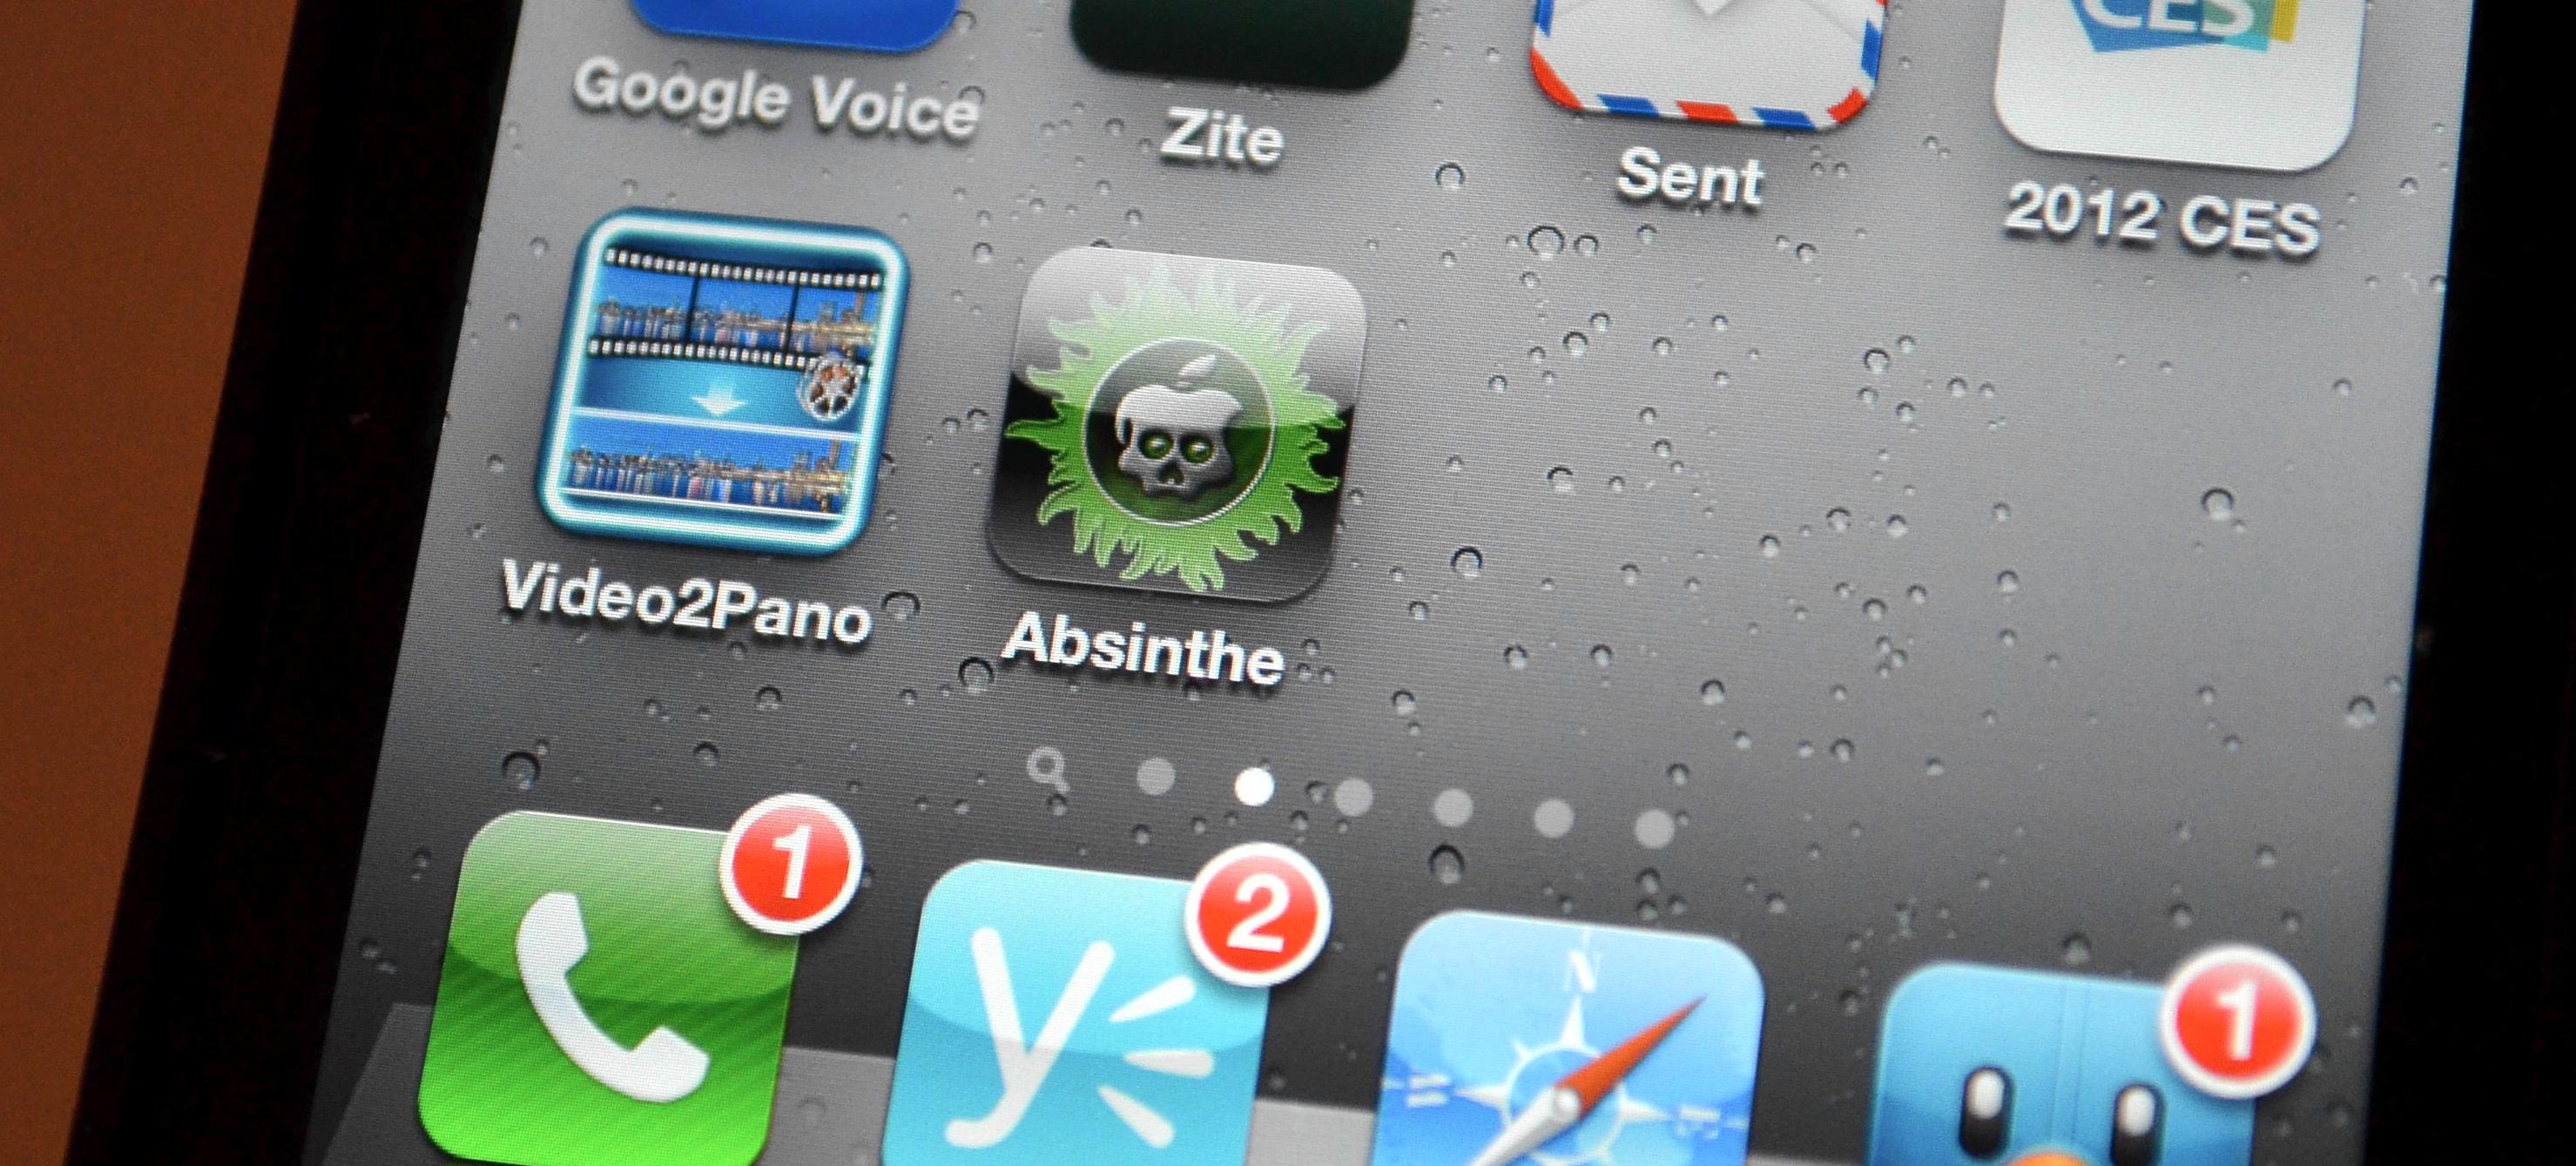 Delete Ios Stock Apps How To Jailbreak The Iphone 4s